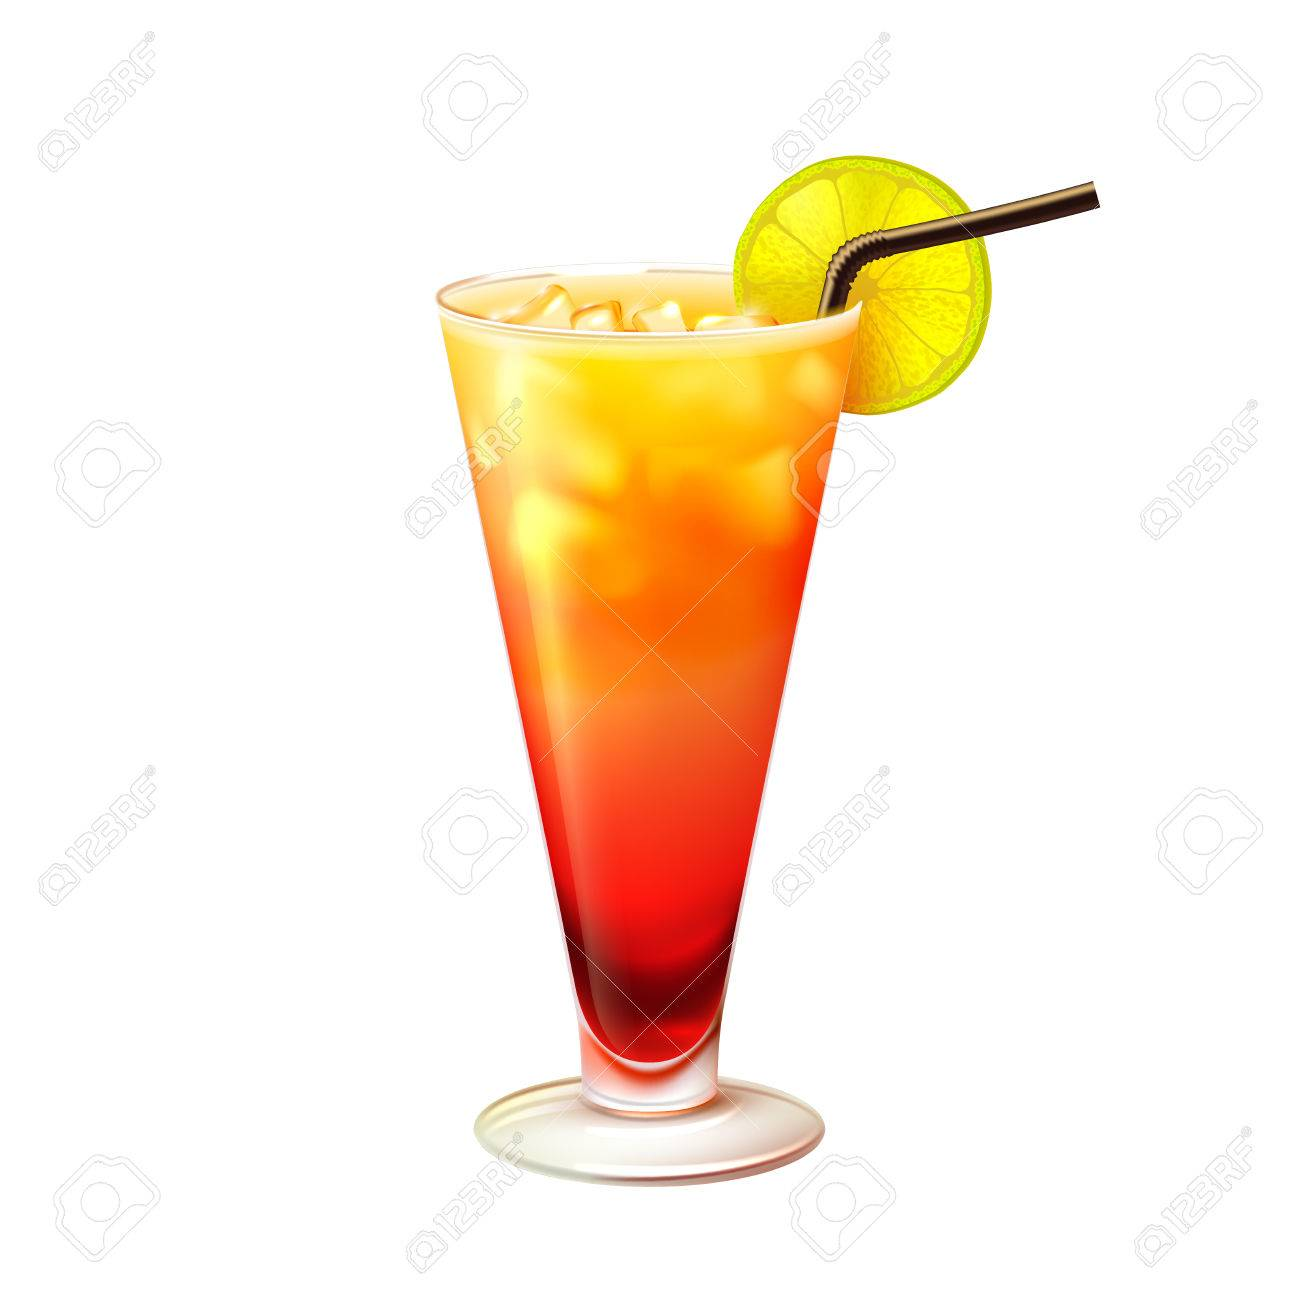 tequila sunrise realistic cocktail in glass with lemon slice rh 123rf com Margaritaville Clip Art Margaritaville Clip Art